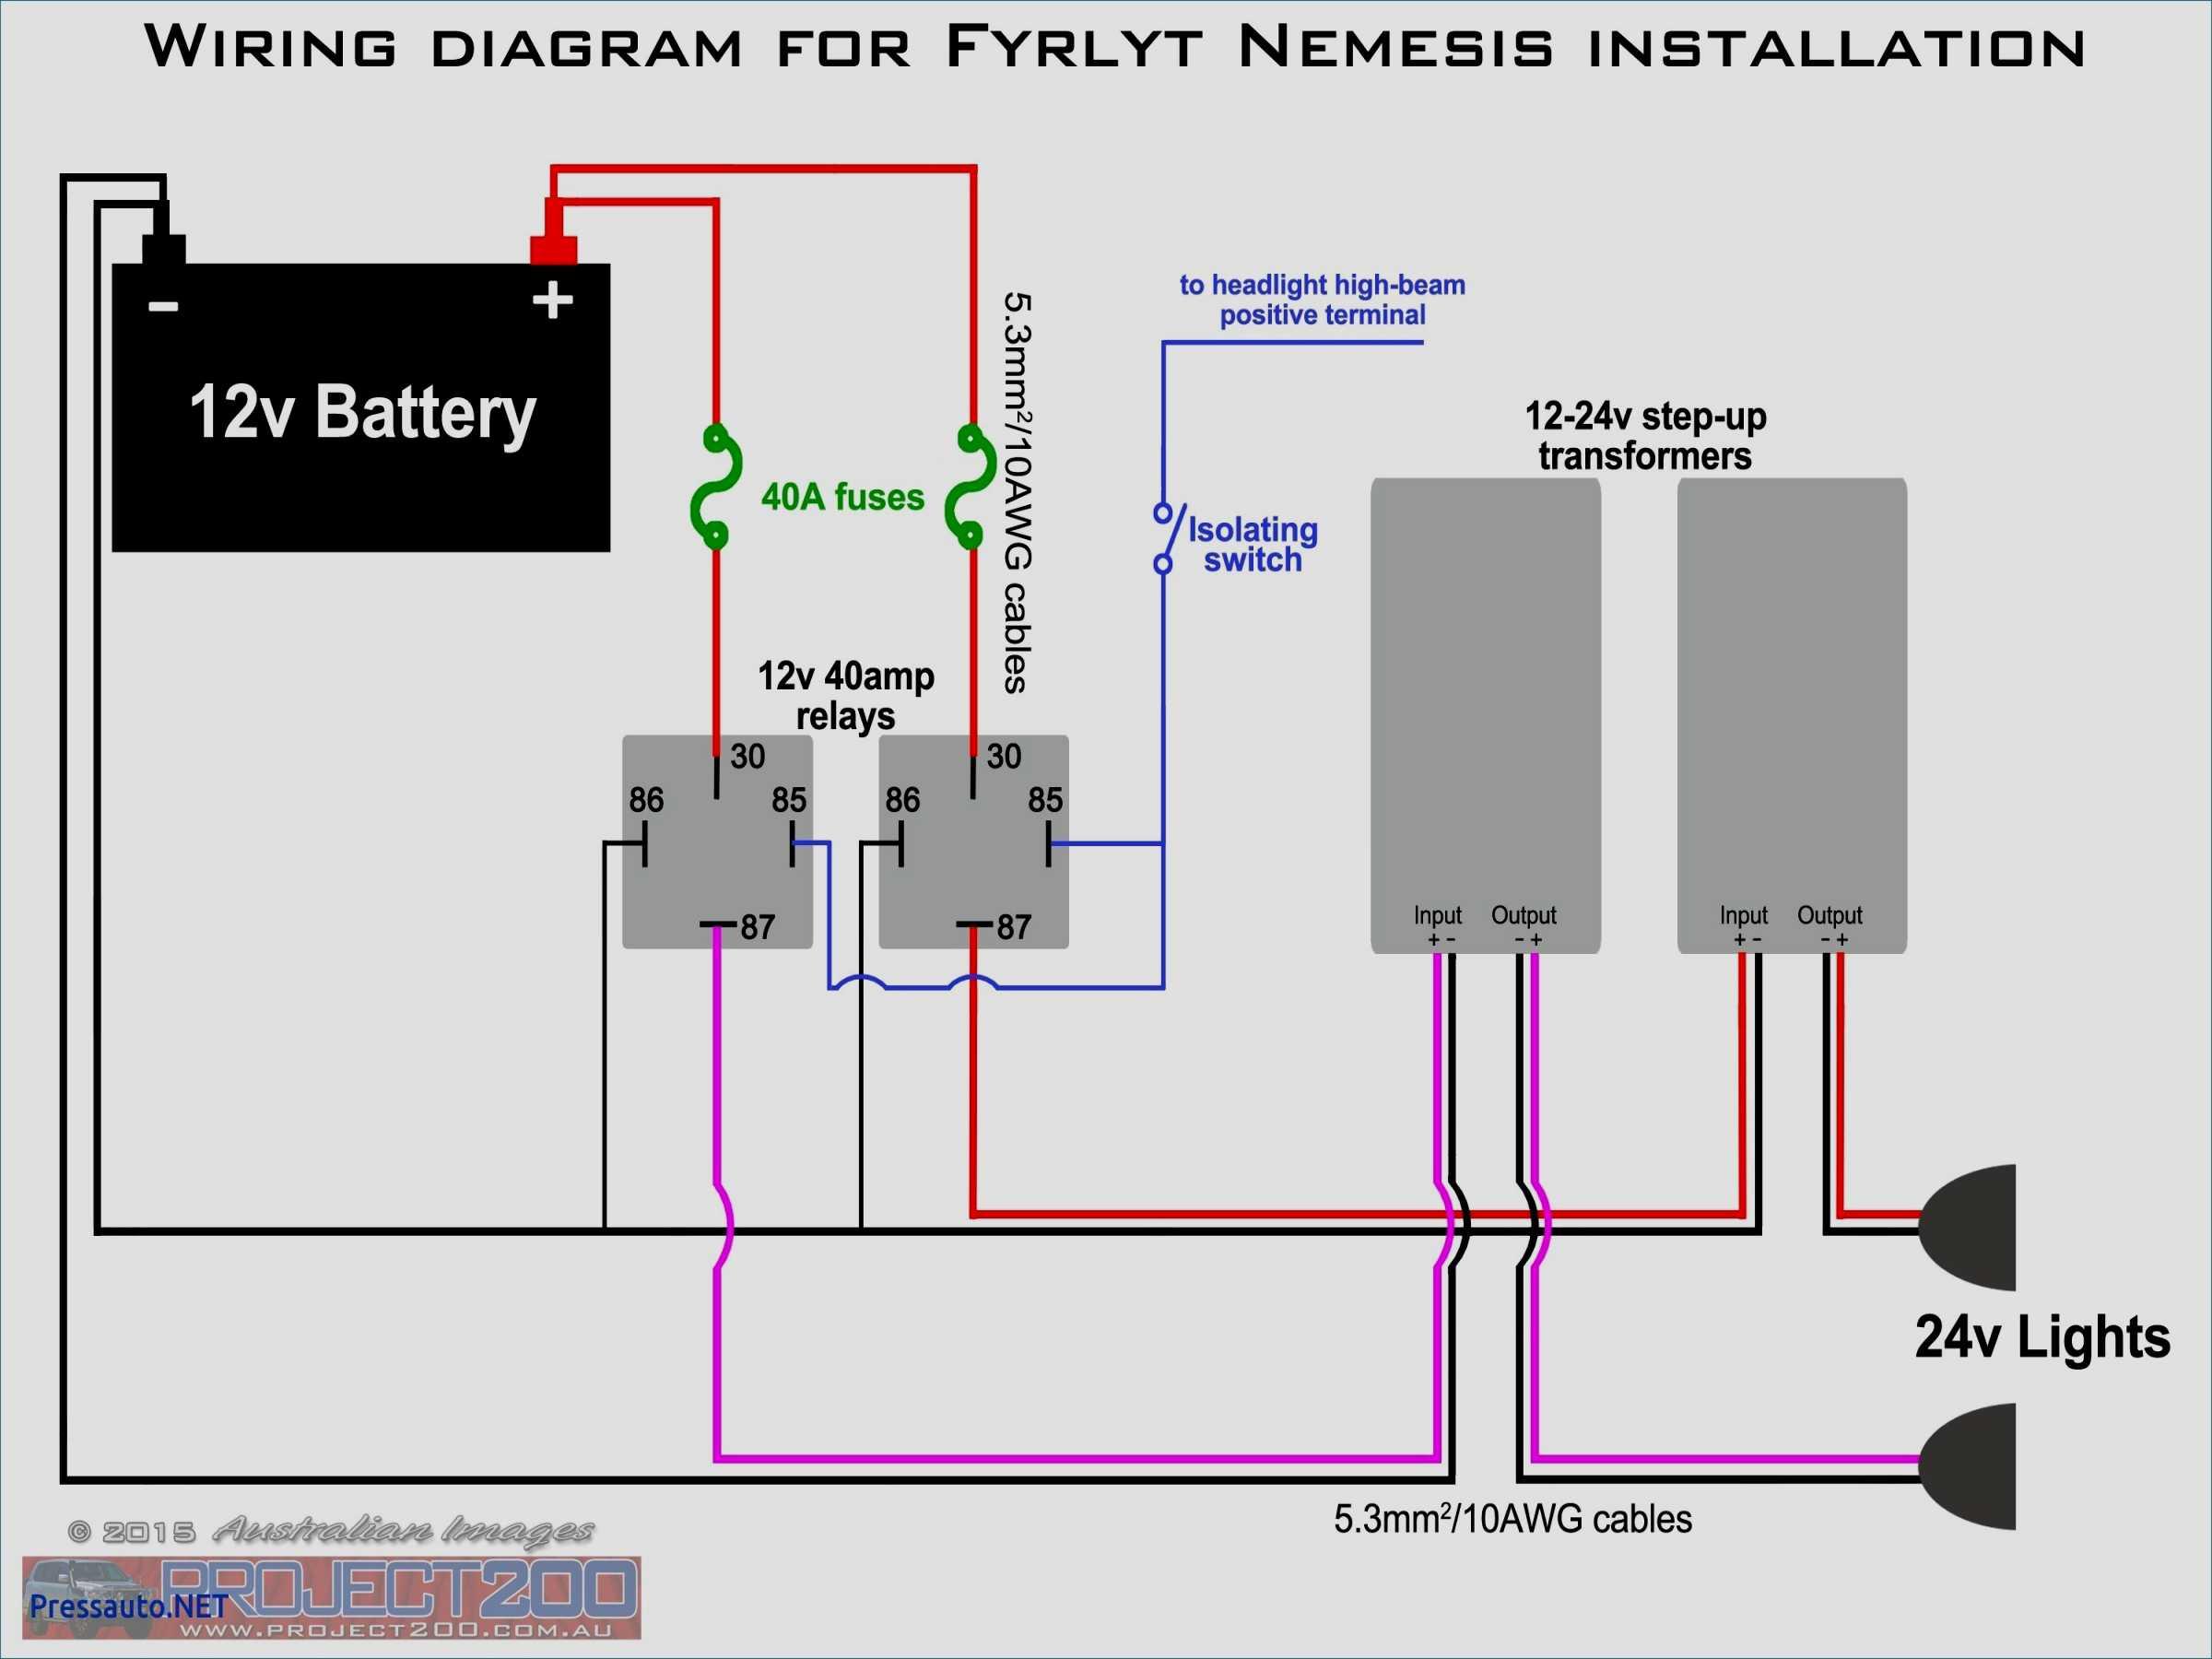 whelen mini edge wiring diagram online wiring diagramwhelen edge 9000 wiring diagram wirings diagramwhelen edge 9000 light bar wiring diagram manual e books